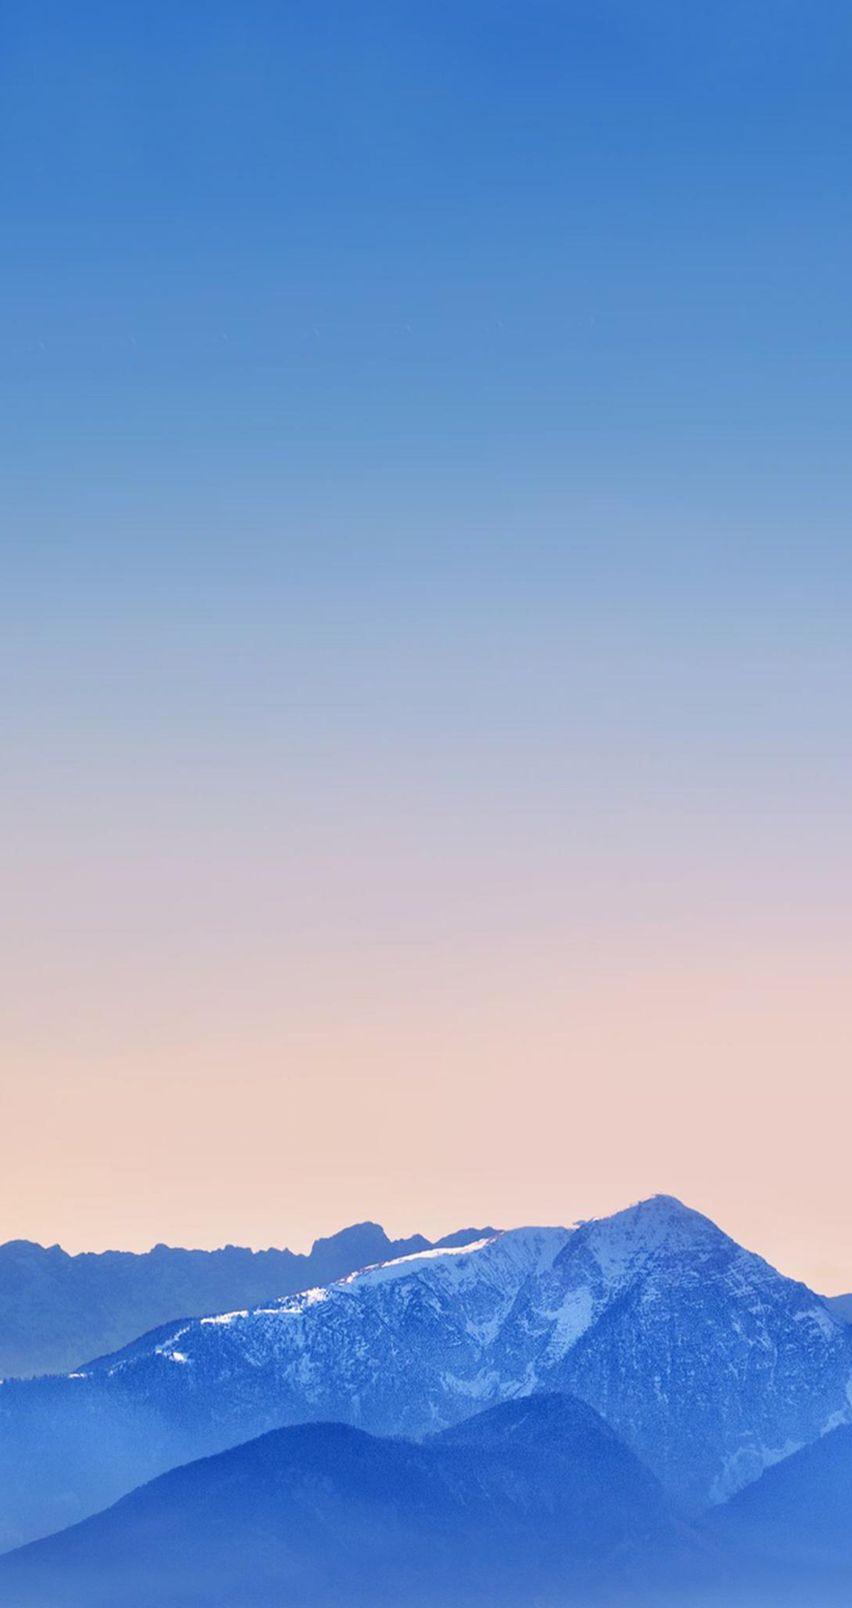 iPhone 6 Wallpaper Retina Bing images Blue Wallpaper